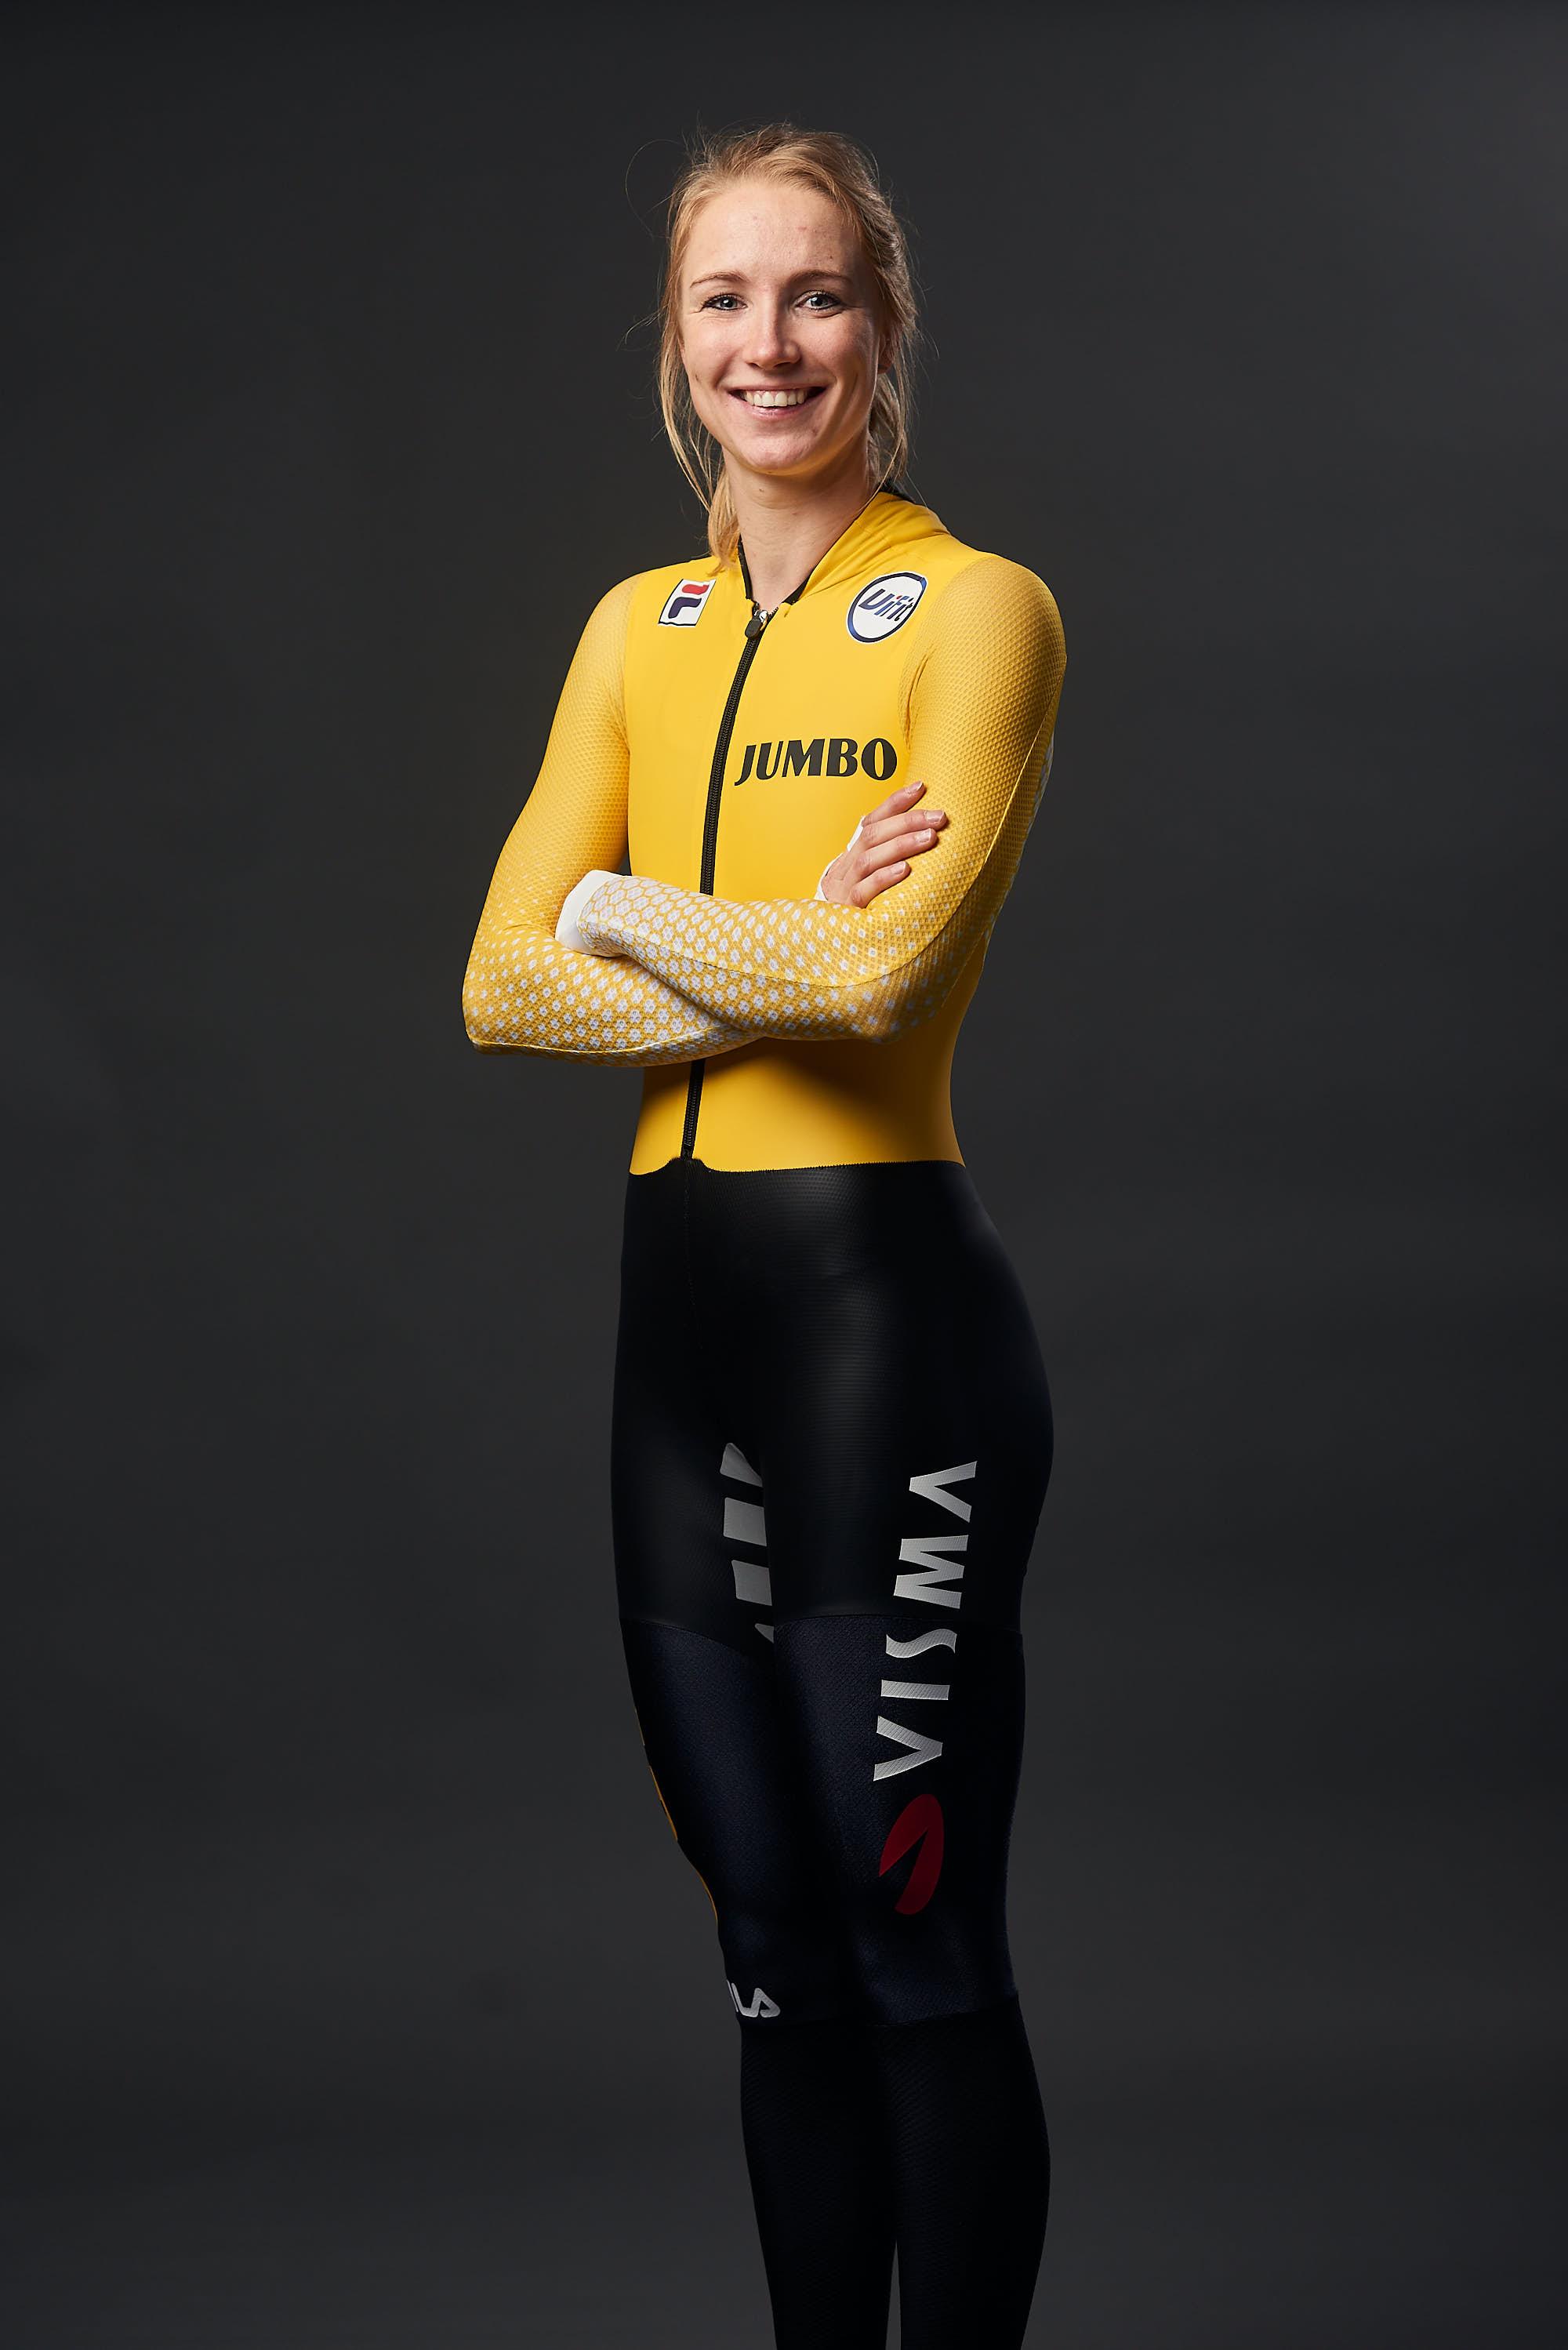 Portrait of Team Jumbo-Visma Ice skater Carlijn Achtereekte